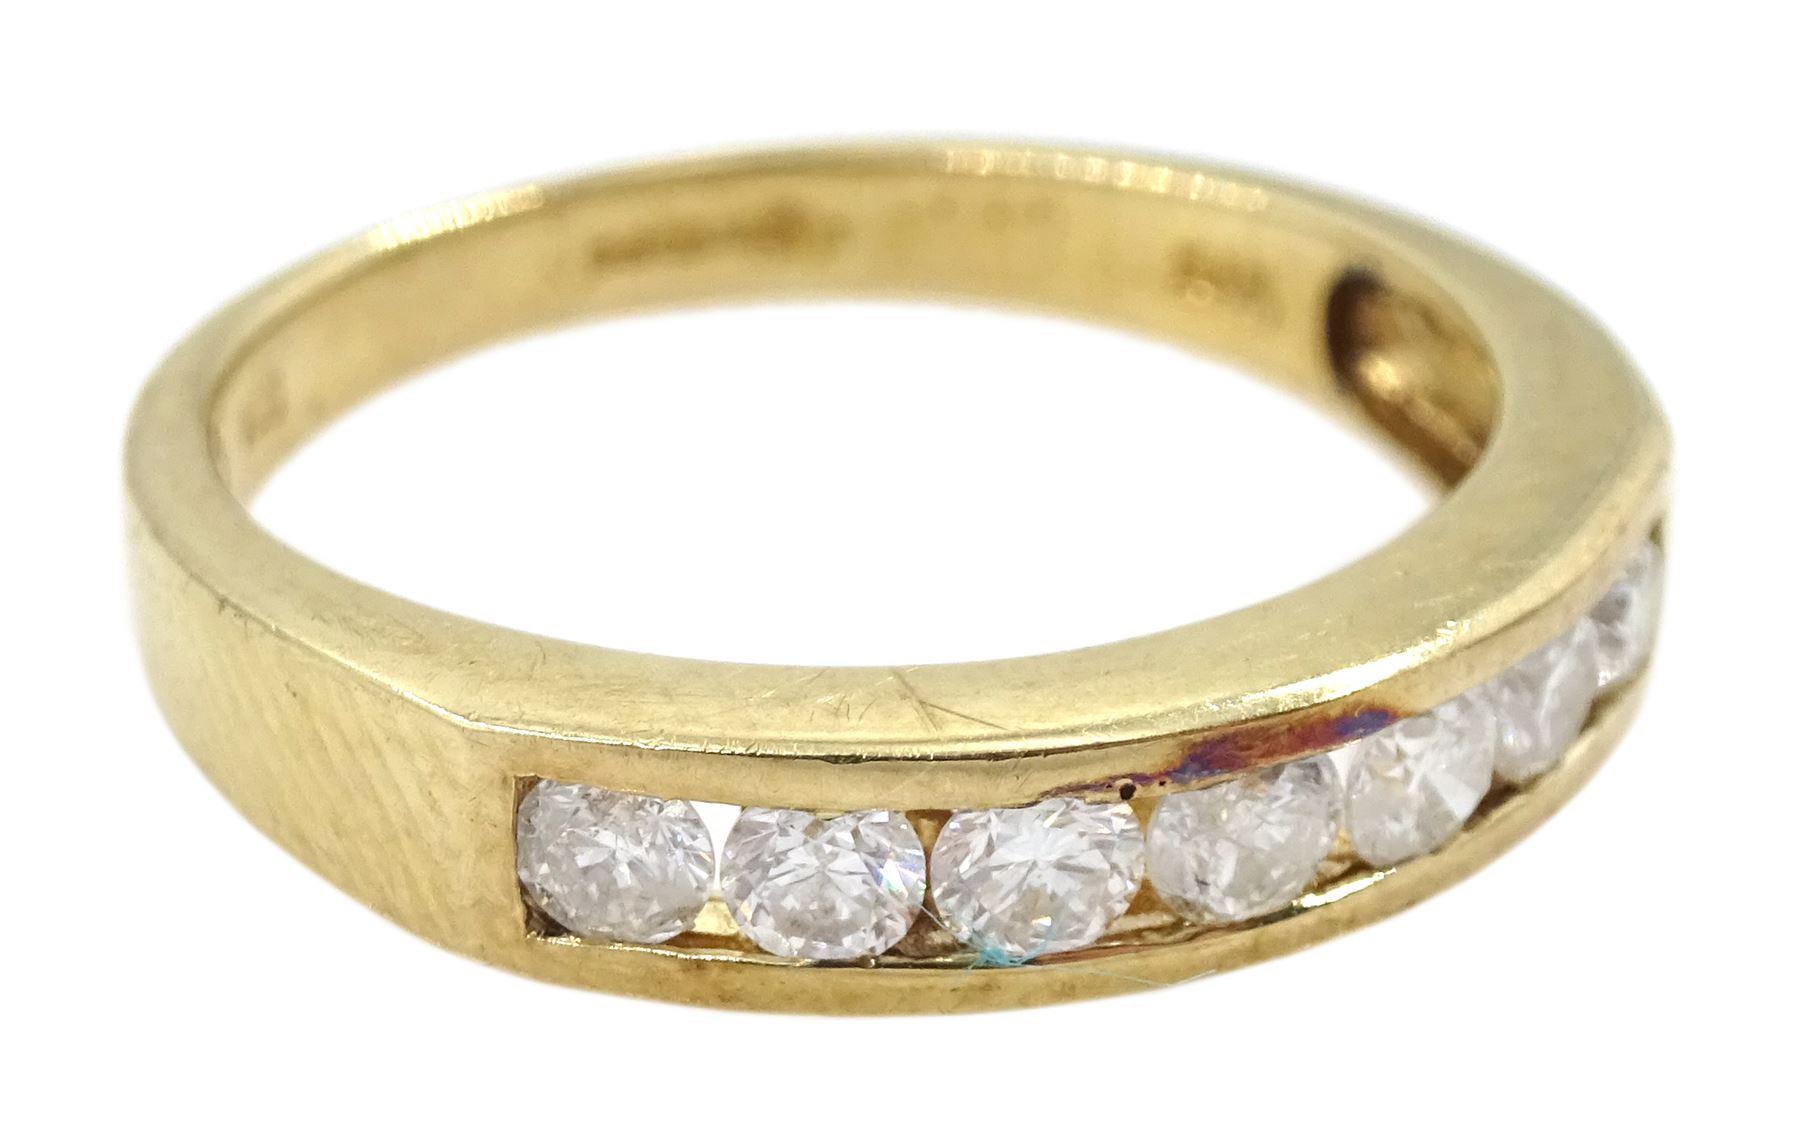 9ct gold round brilliant cut diamond seven stone channel set stone ring - Image 3 of 4